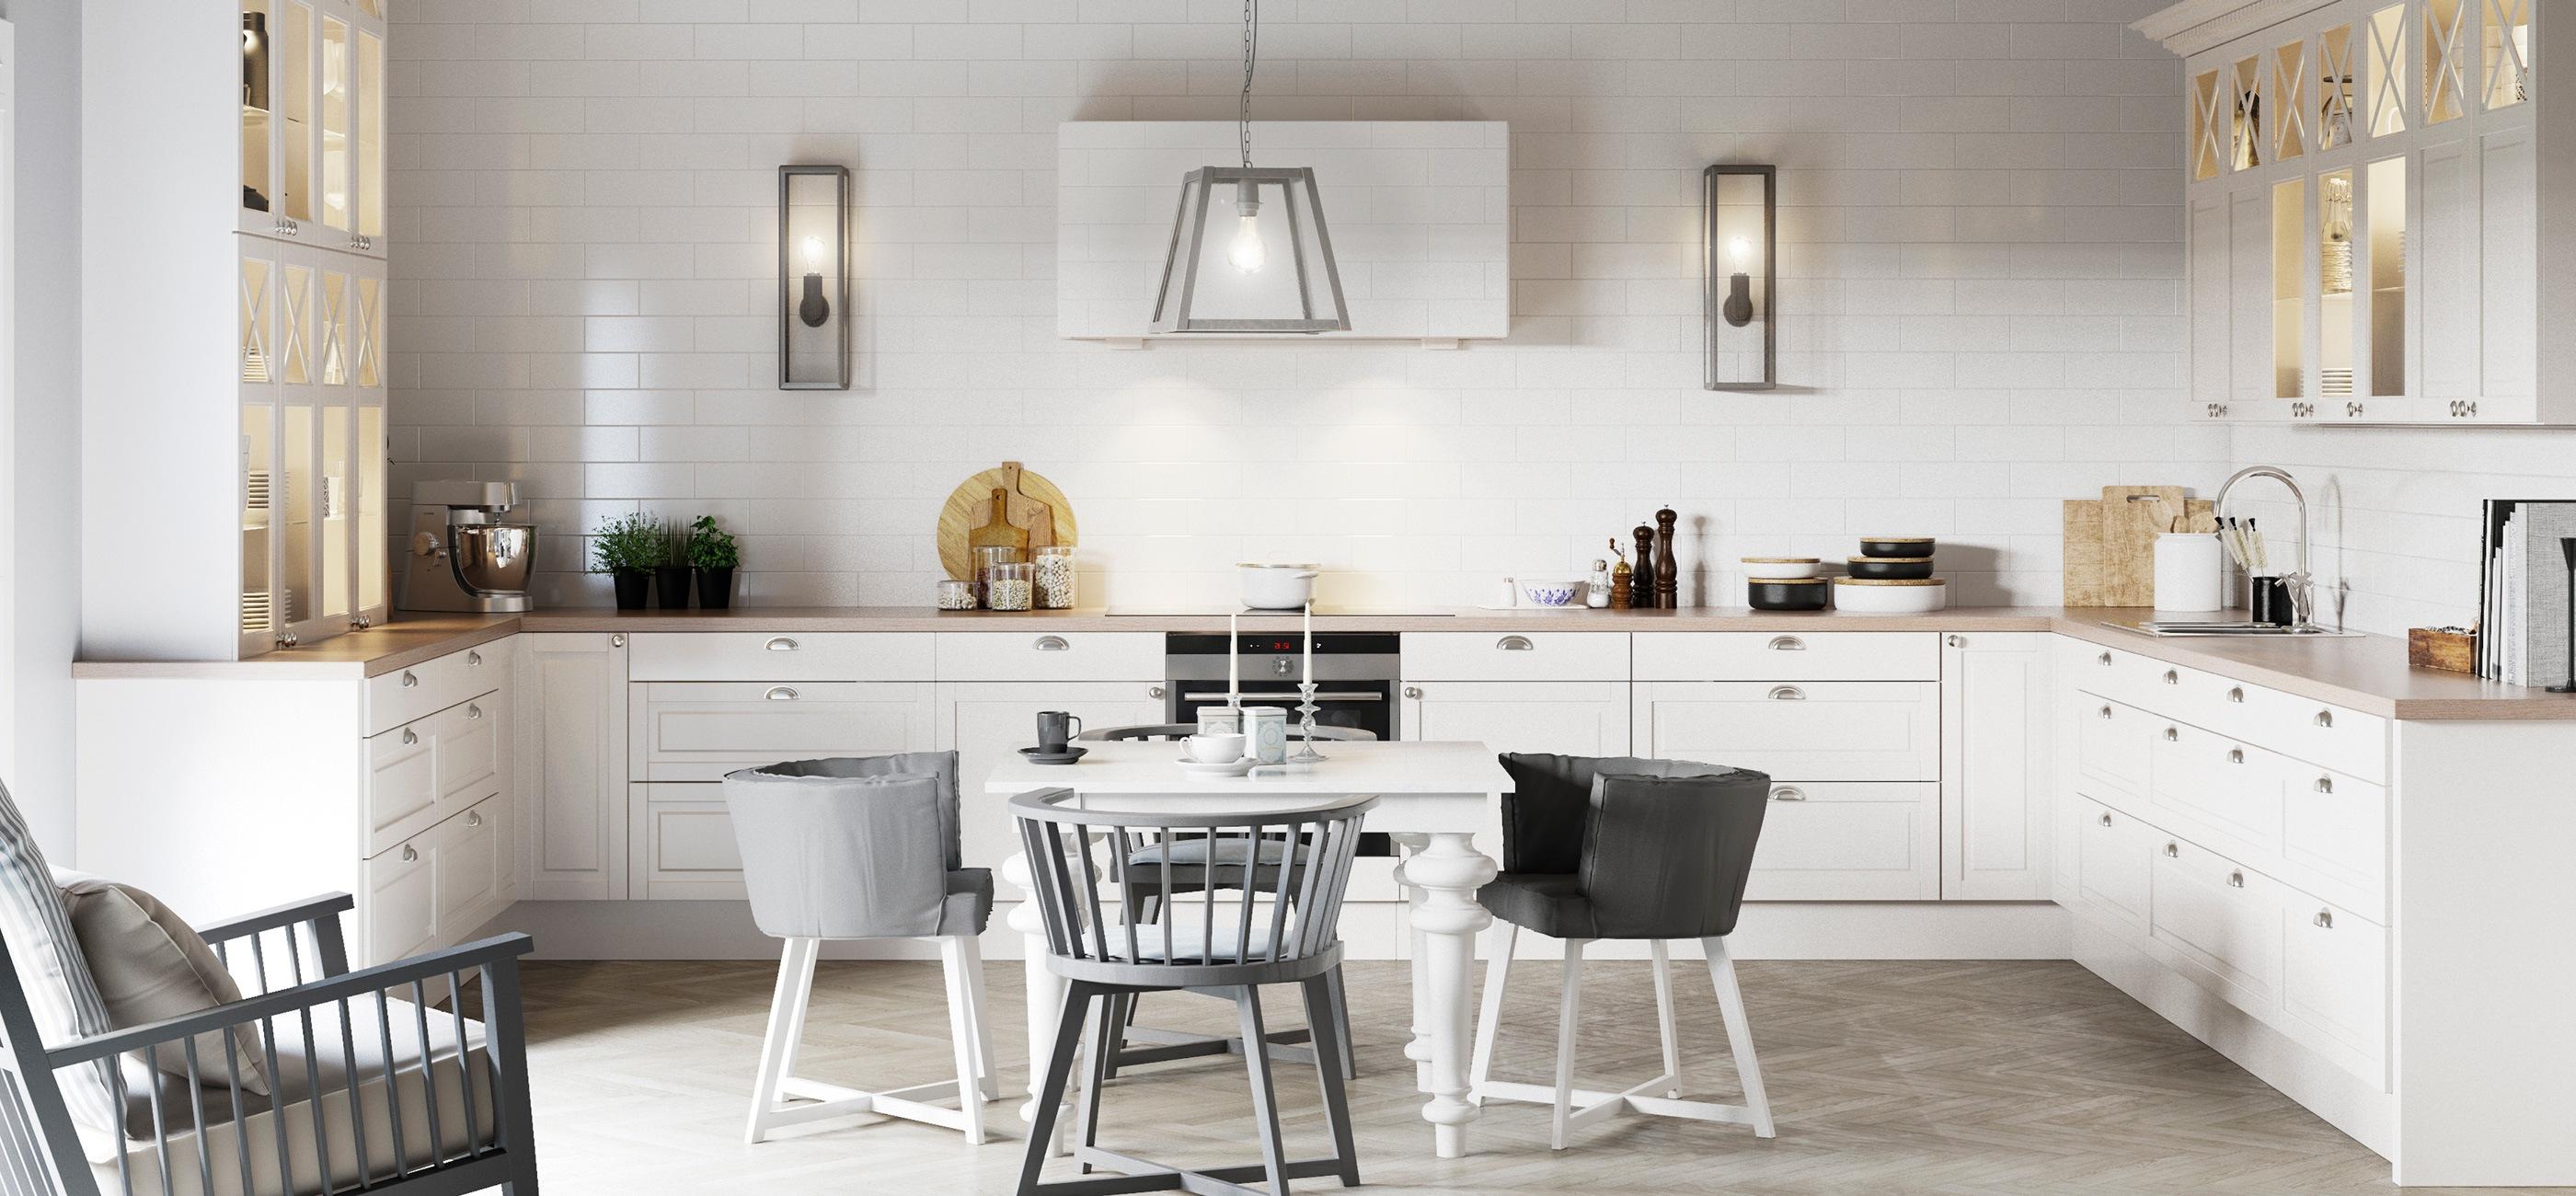 traditional pendant lighting for kitchen